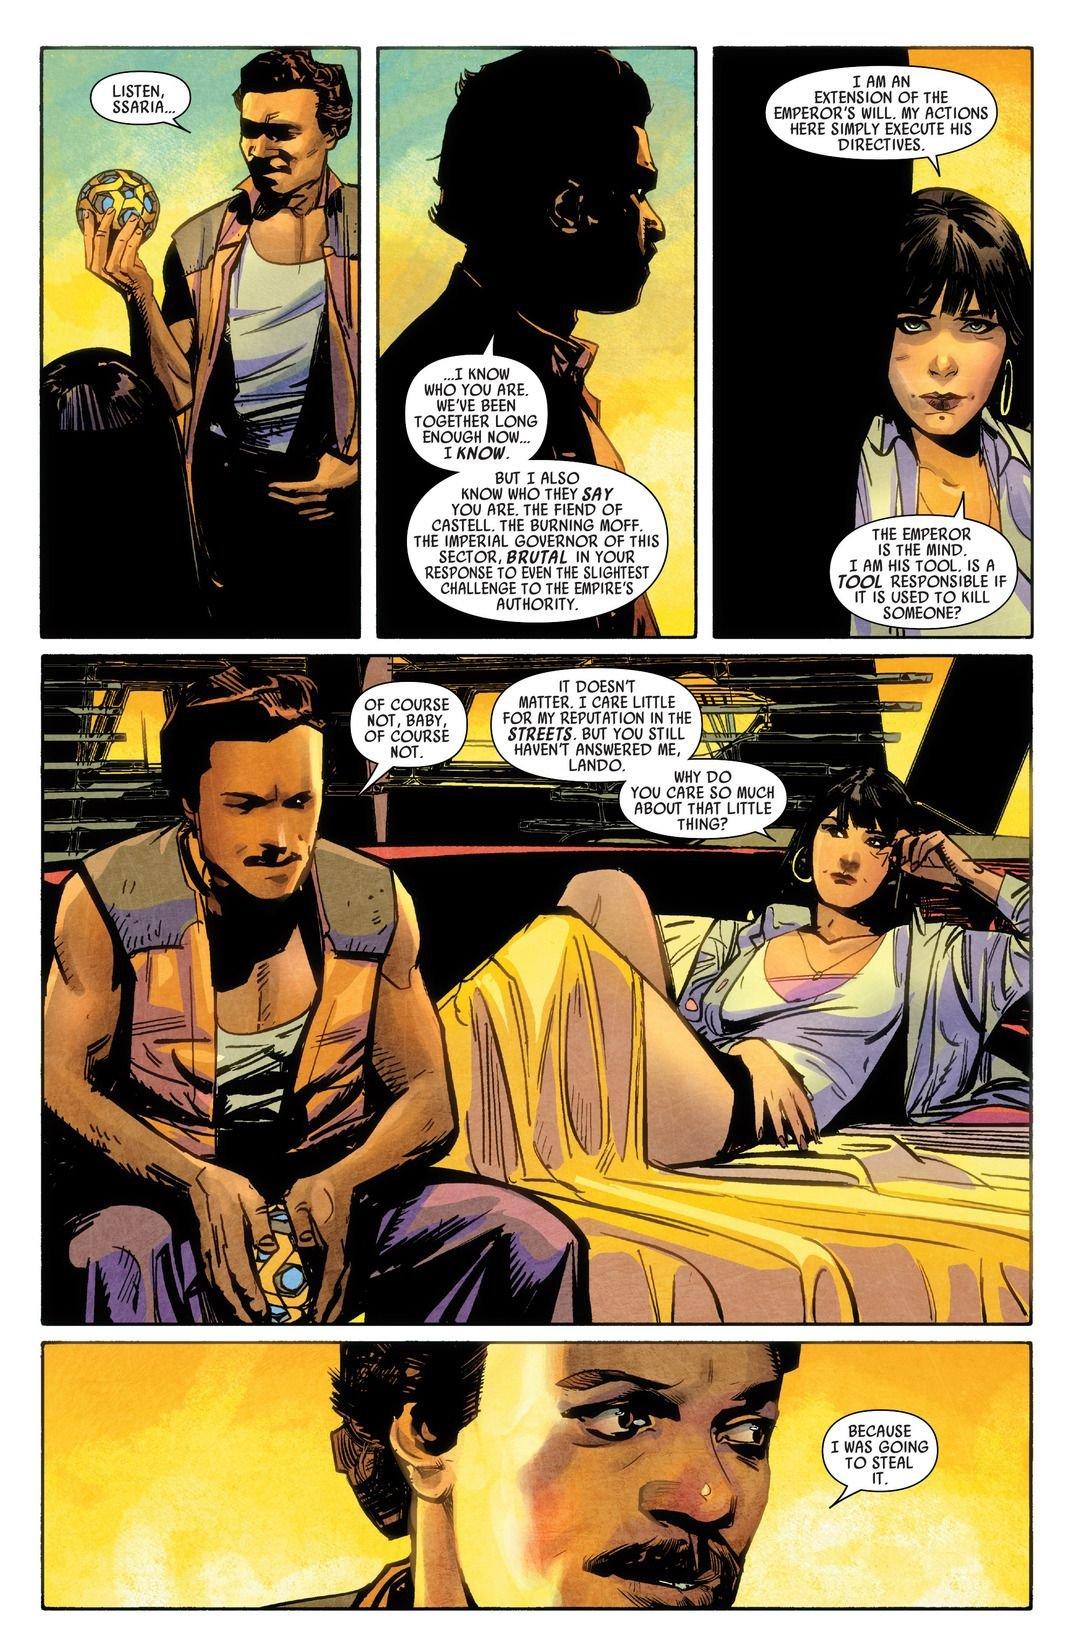 Lando #1-5 (Comic) Review 3